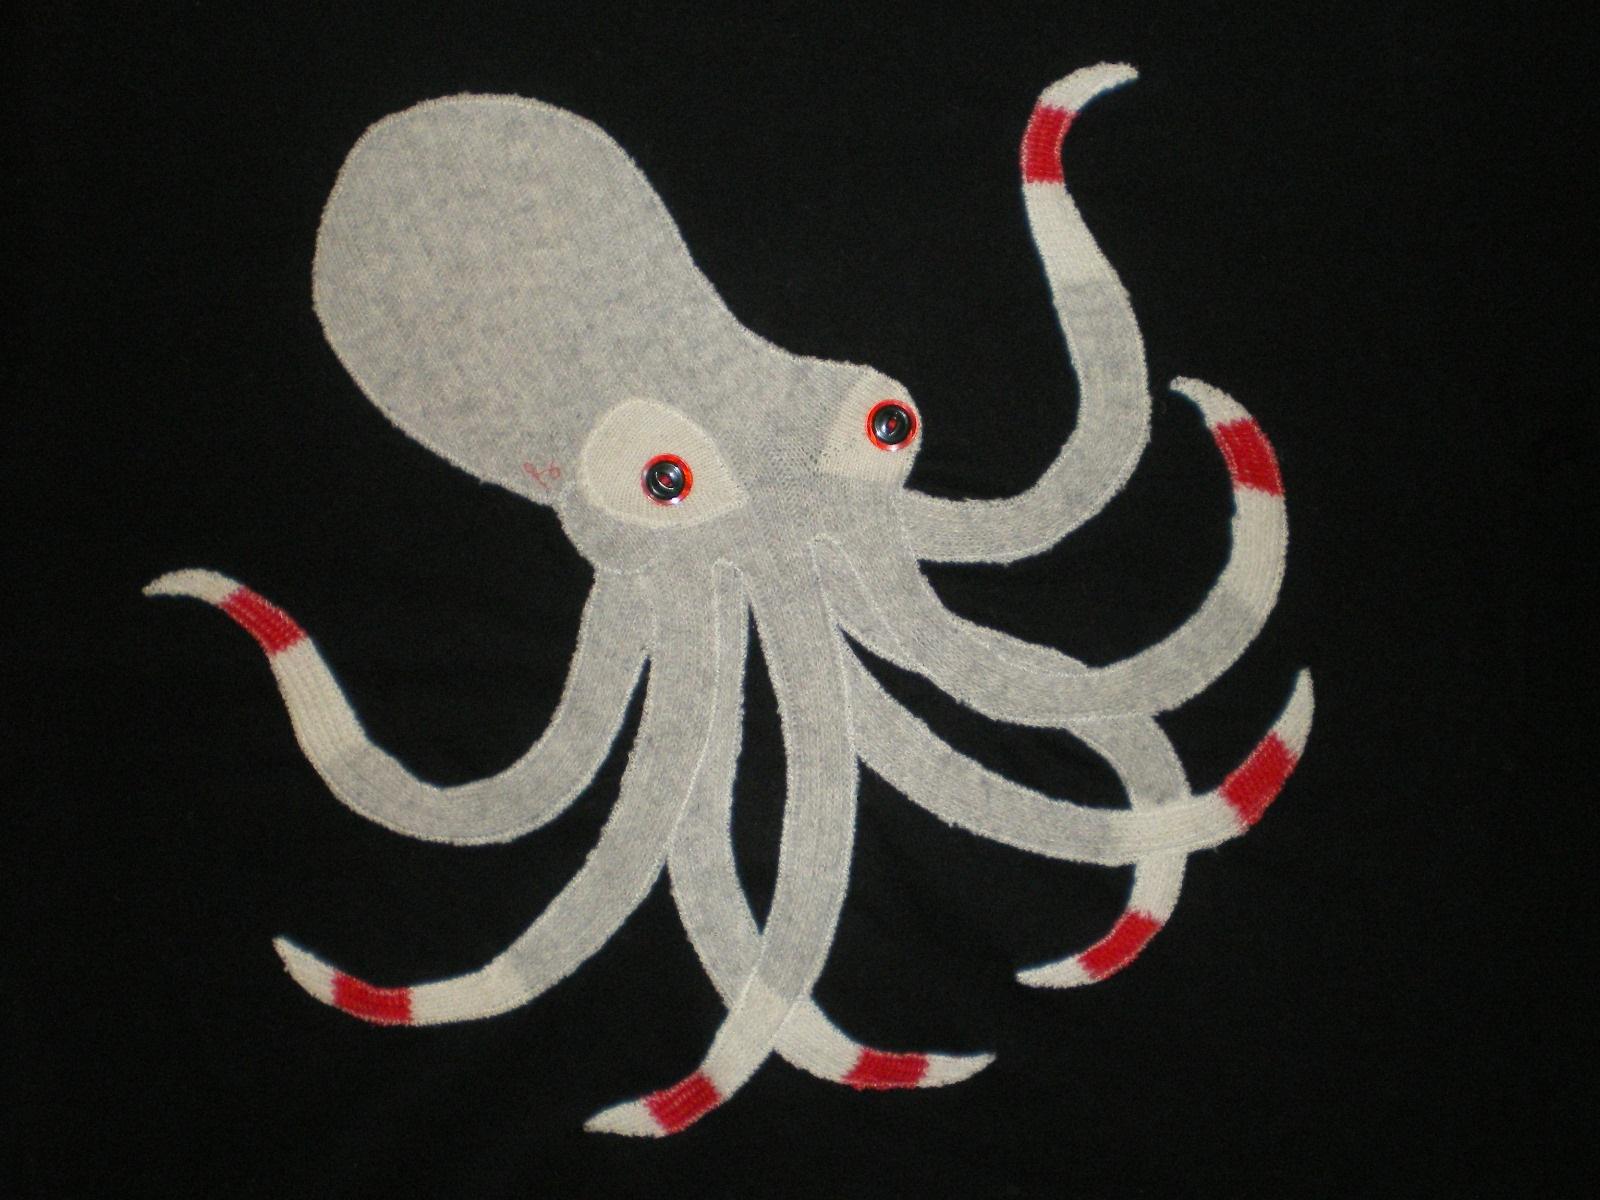 Rorokiti Smevil Socktopus Applique Teeshirt